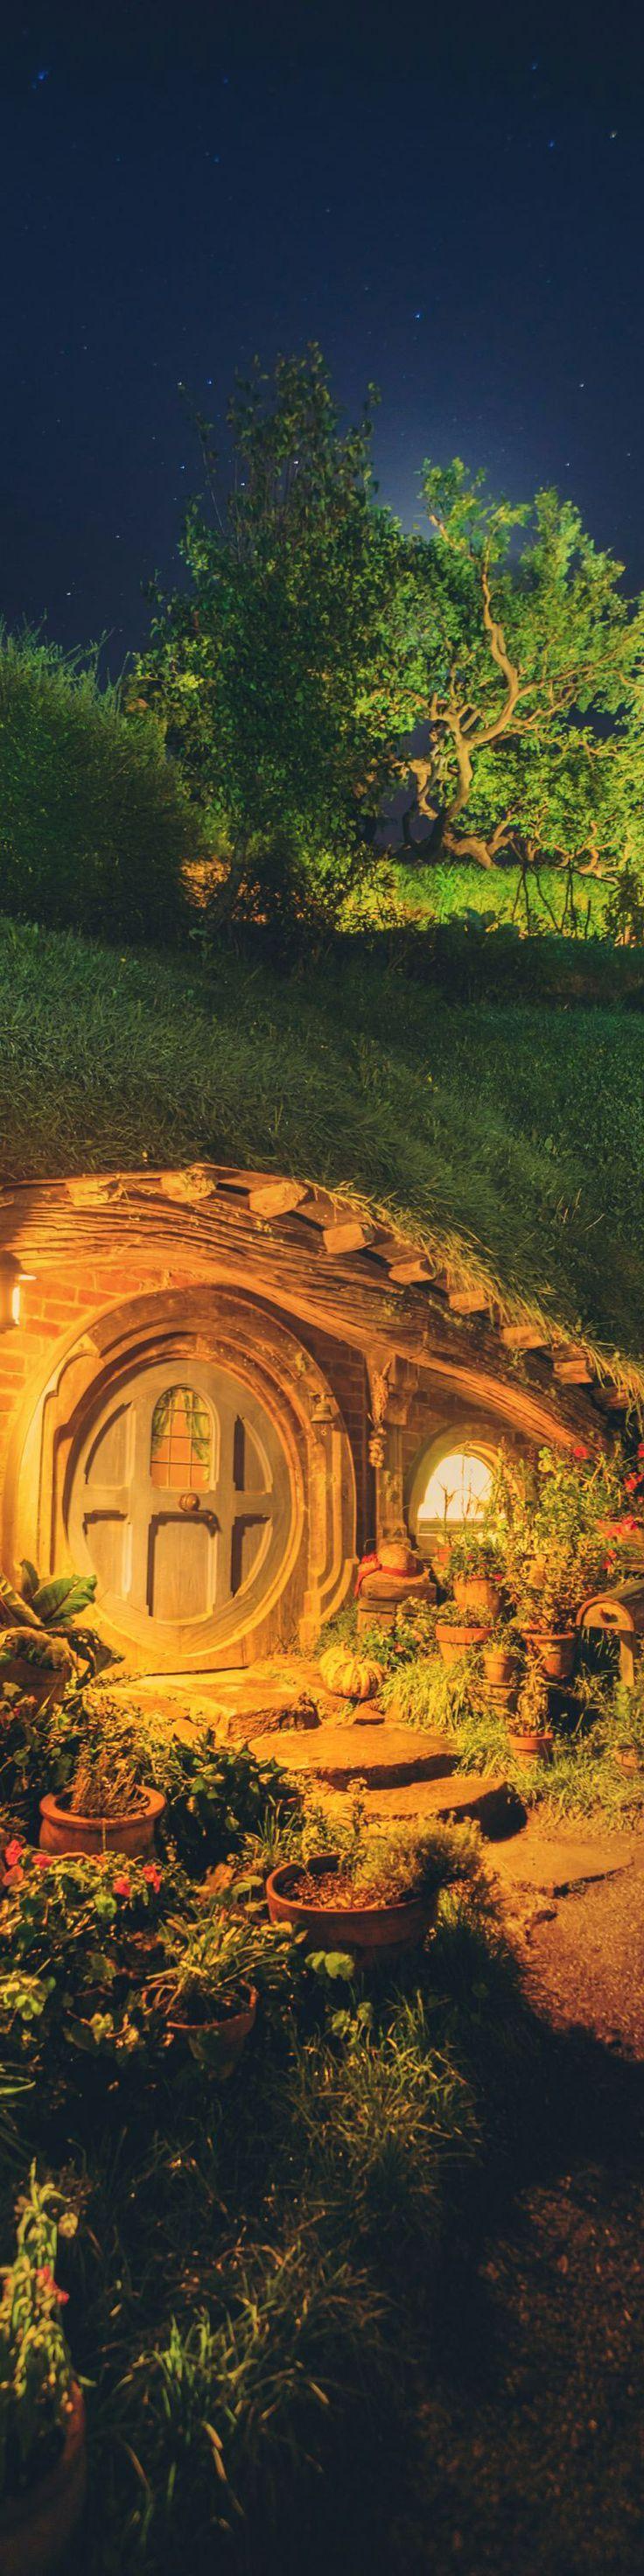 Hobbit Hole at Night